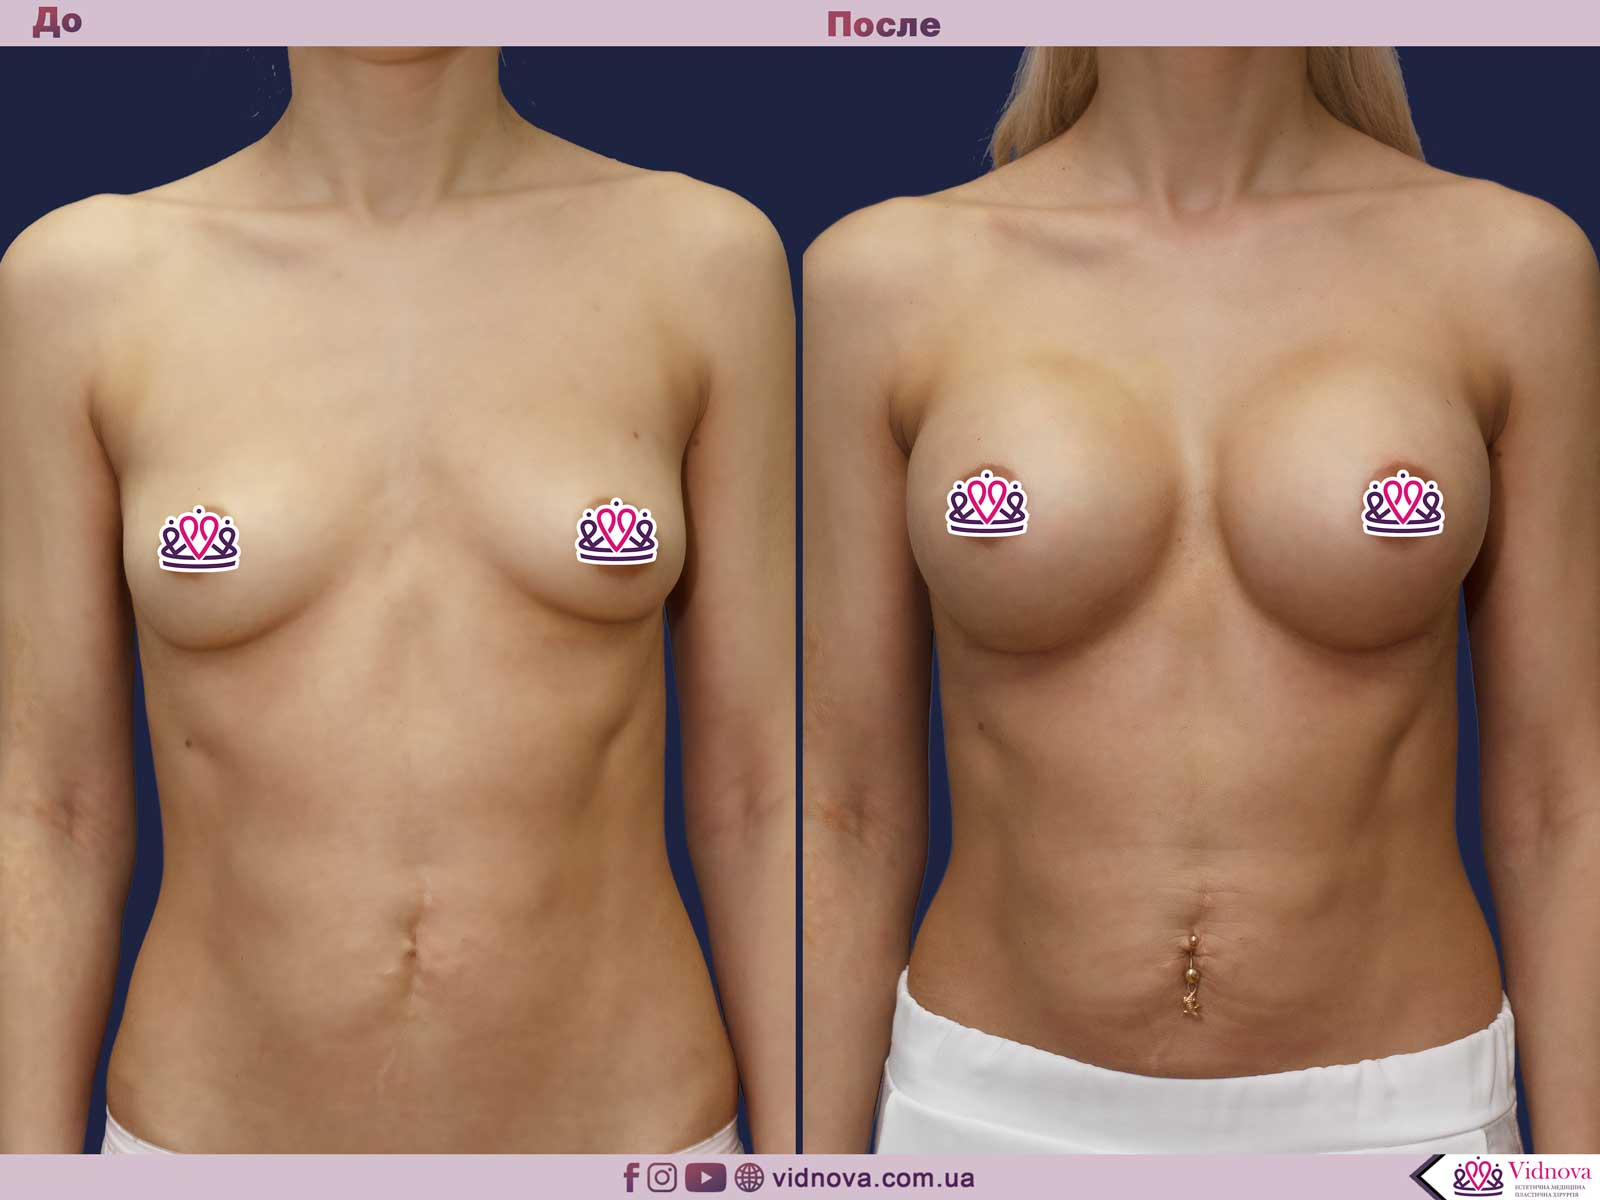 Увеличение груди: Фото ДО и ПОСЛЕ - Пример №69-1 - Клиника Vidnova